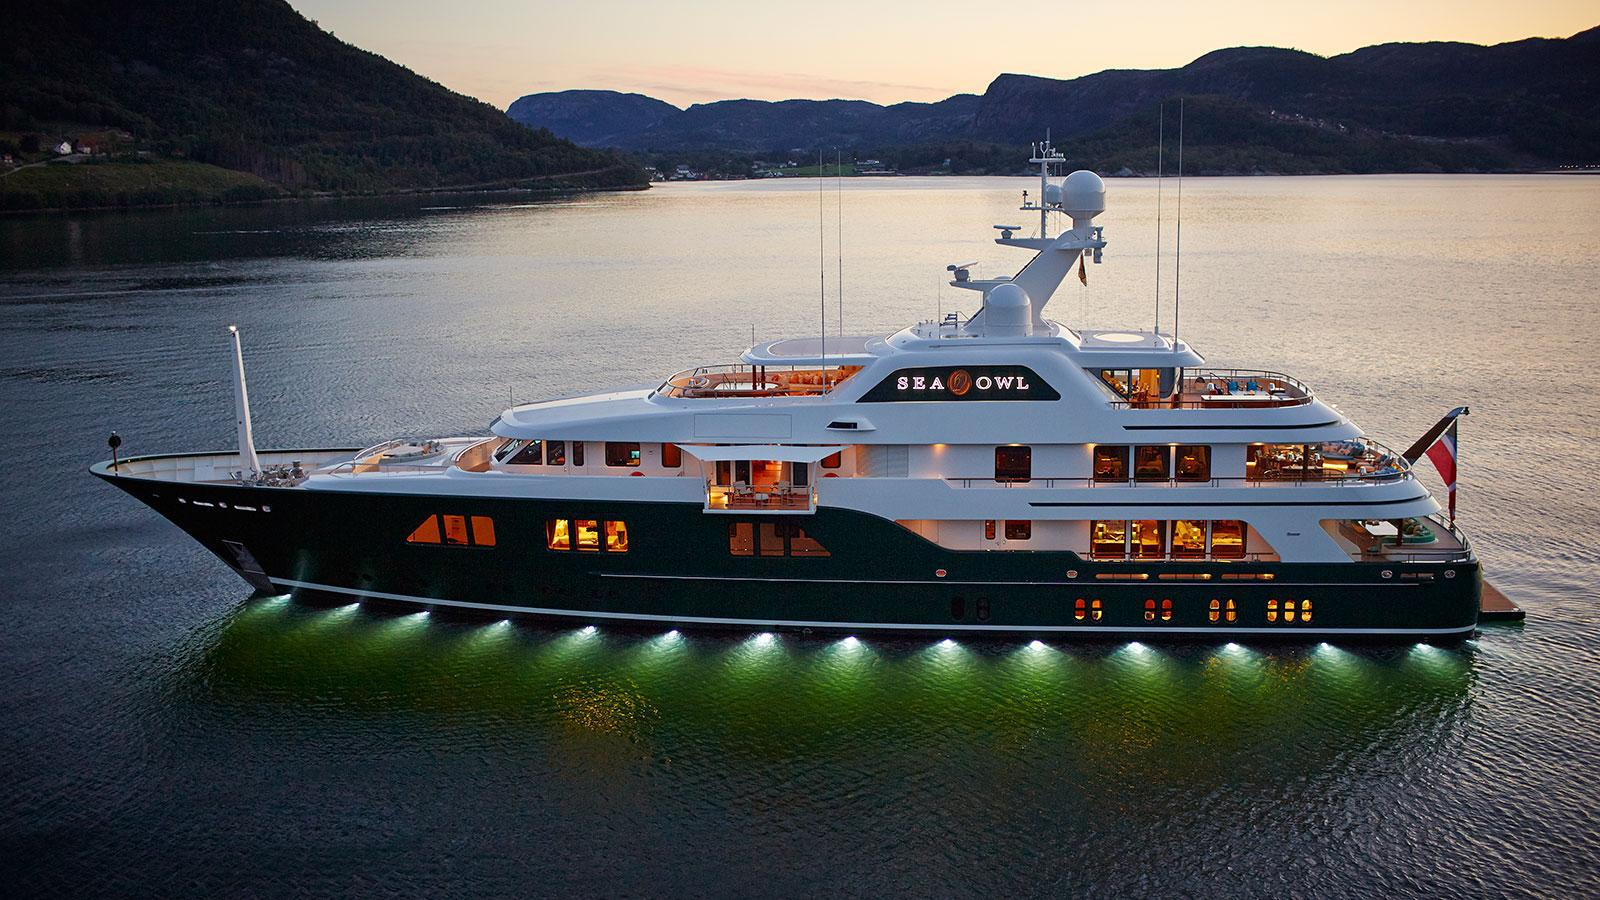 sea-owl-motor-yacht-feadship-2013-62m-profile-by-night